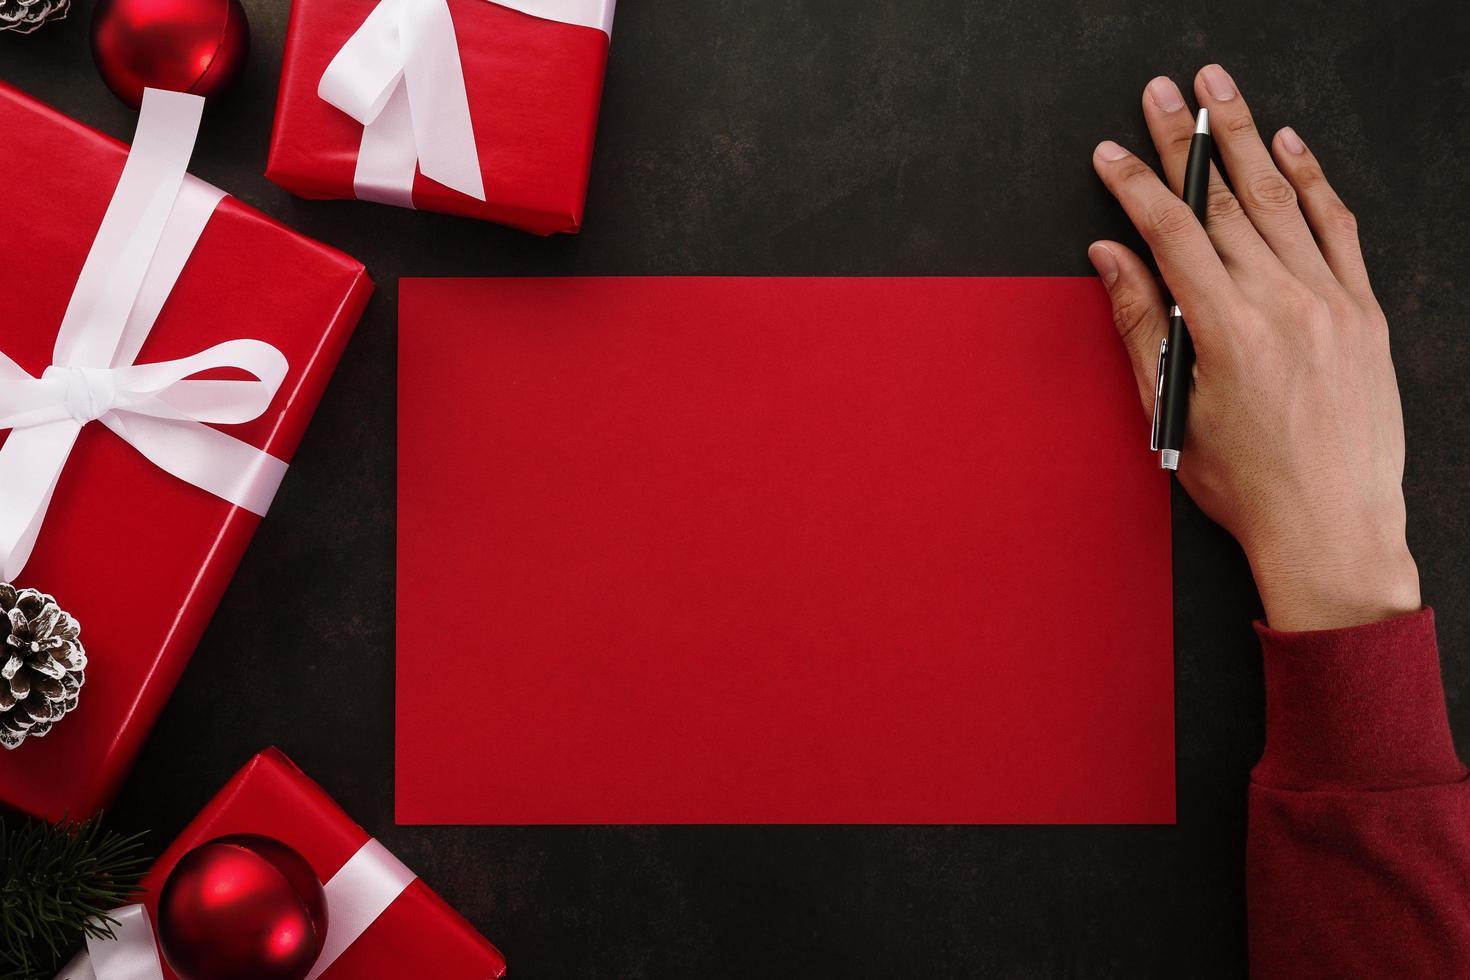 Hands writing red greeting card mockup photo